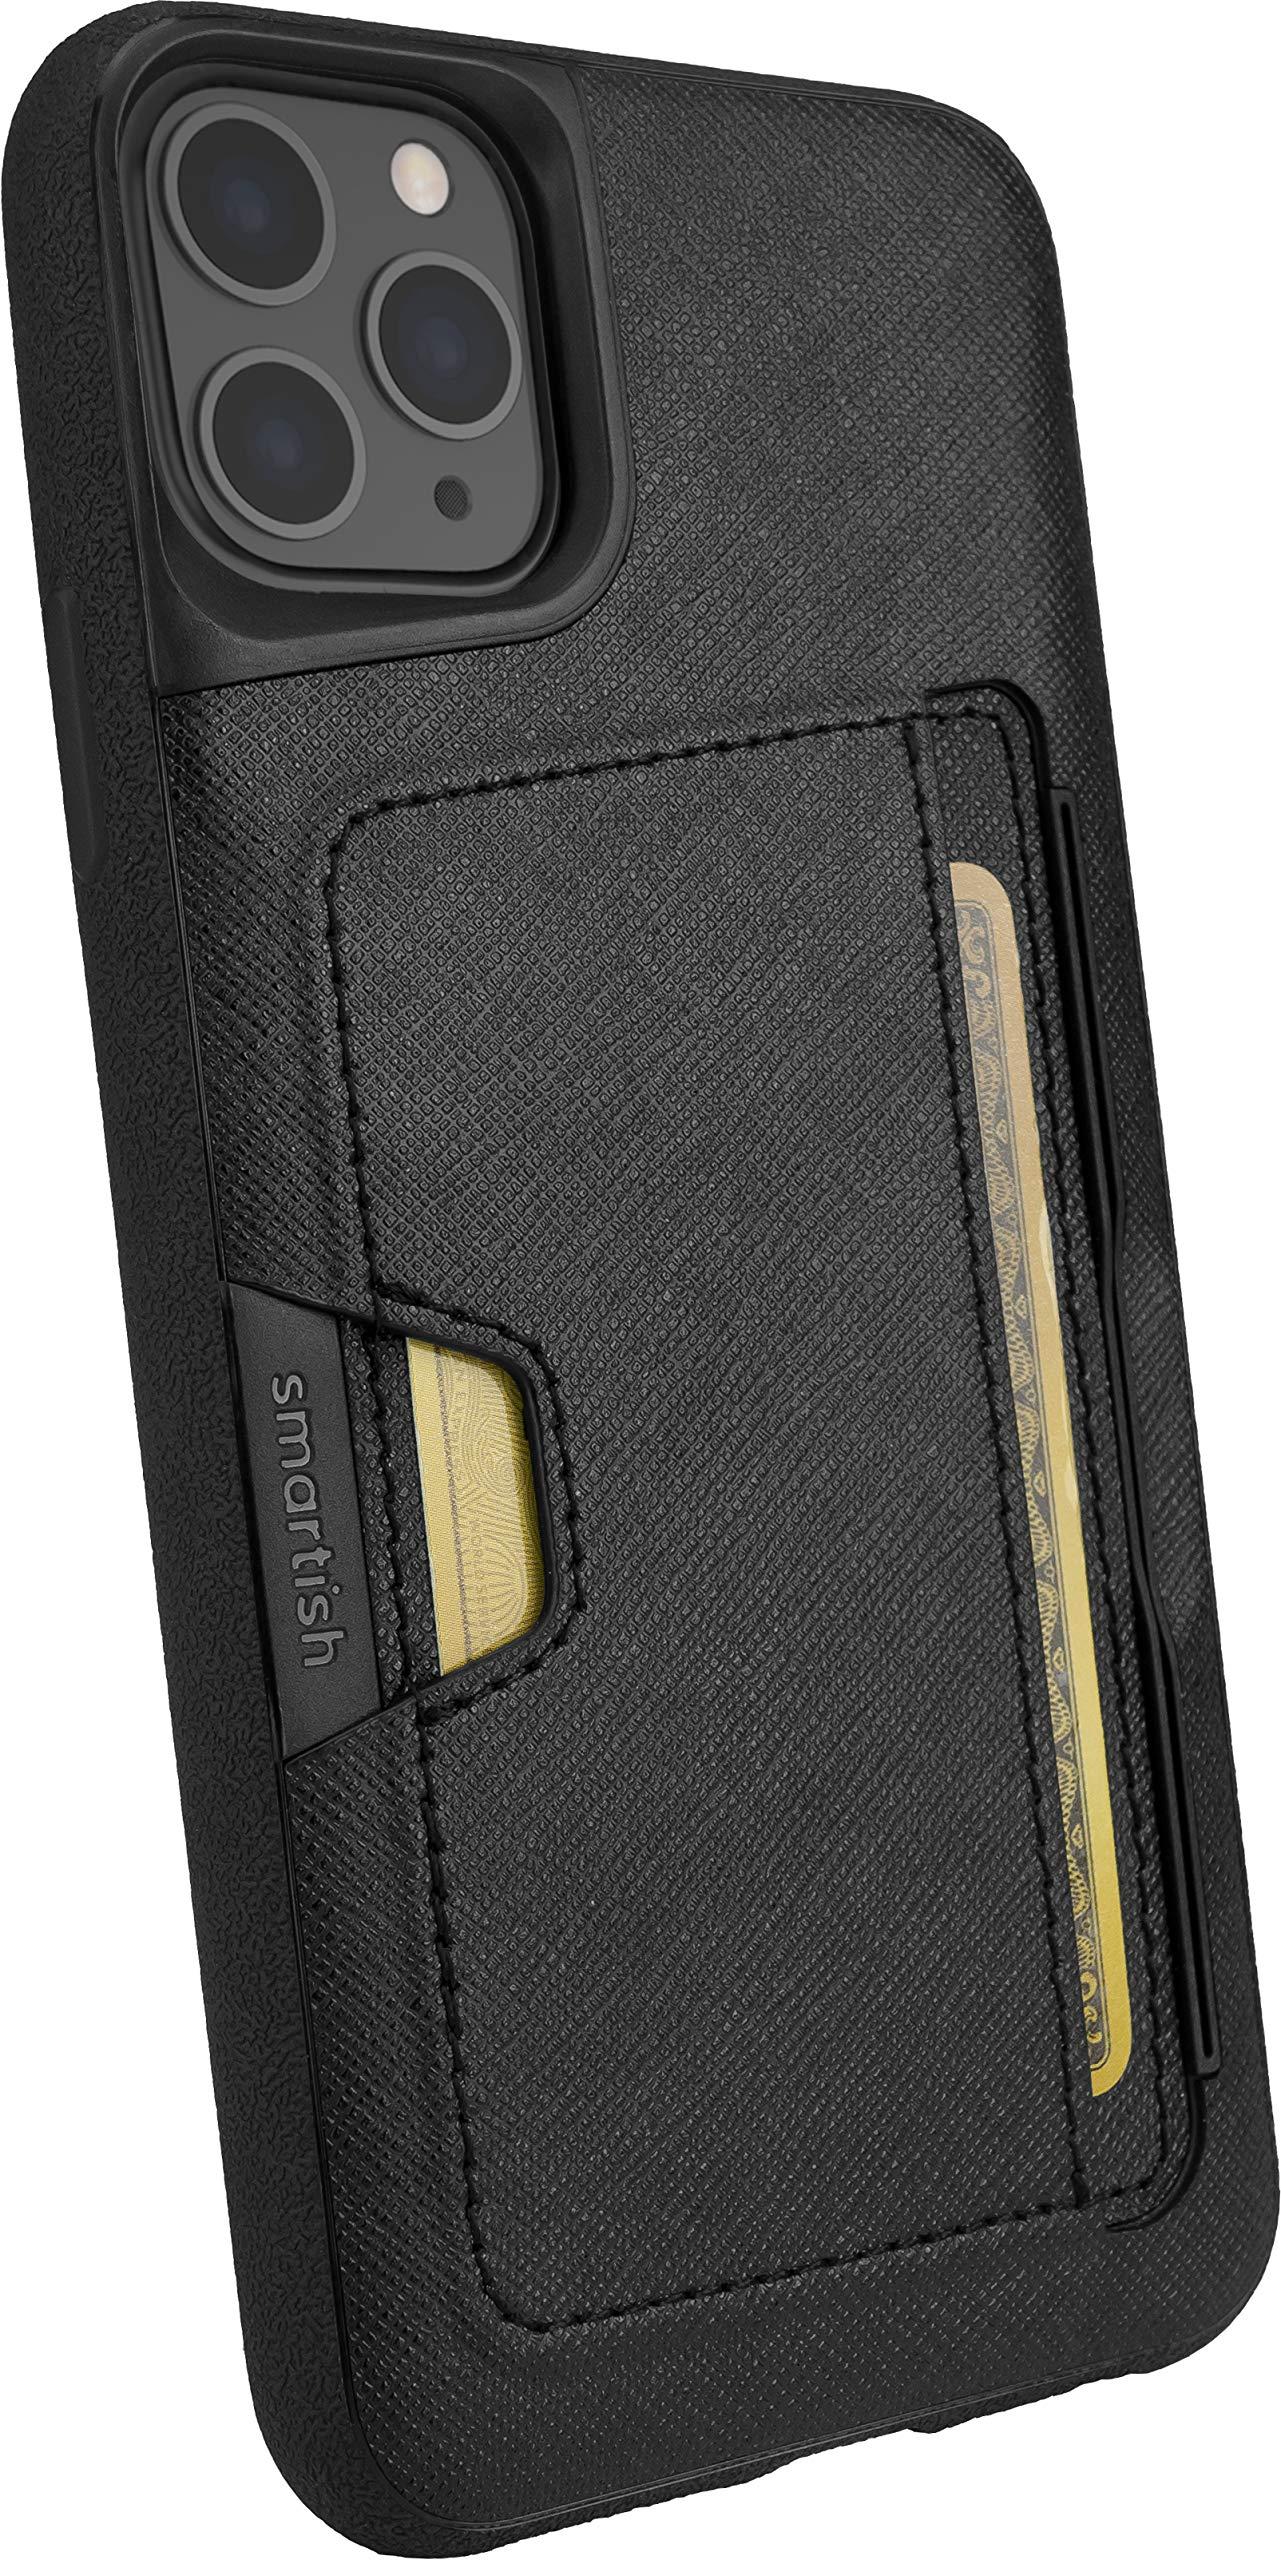 Smartish iPhone 11 Pro Max Wallet Case - Wallet Slayer Vol. 2 [Slim Protective Kickstand] Credit Card Holder (Silk) - Black Tie Affair